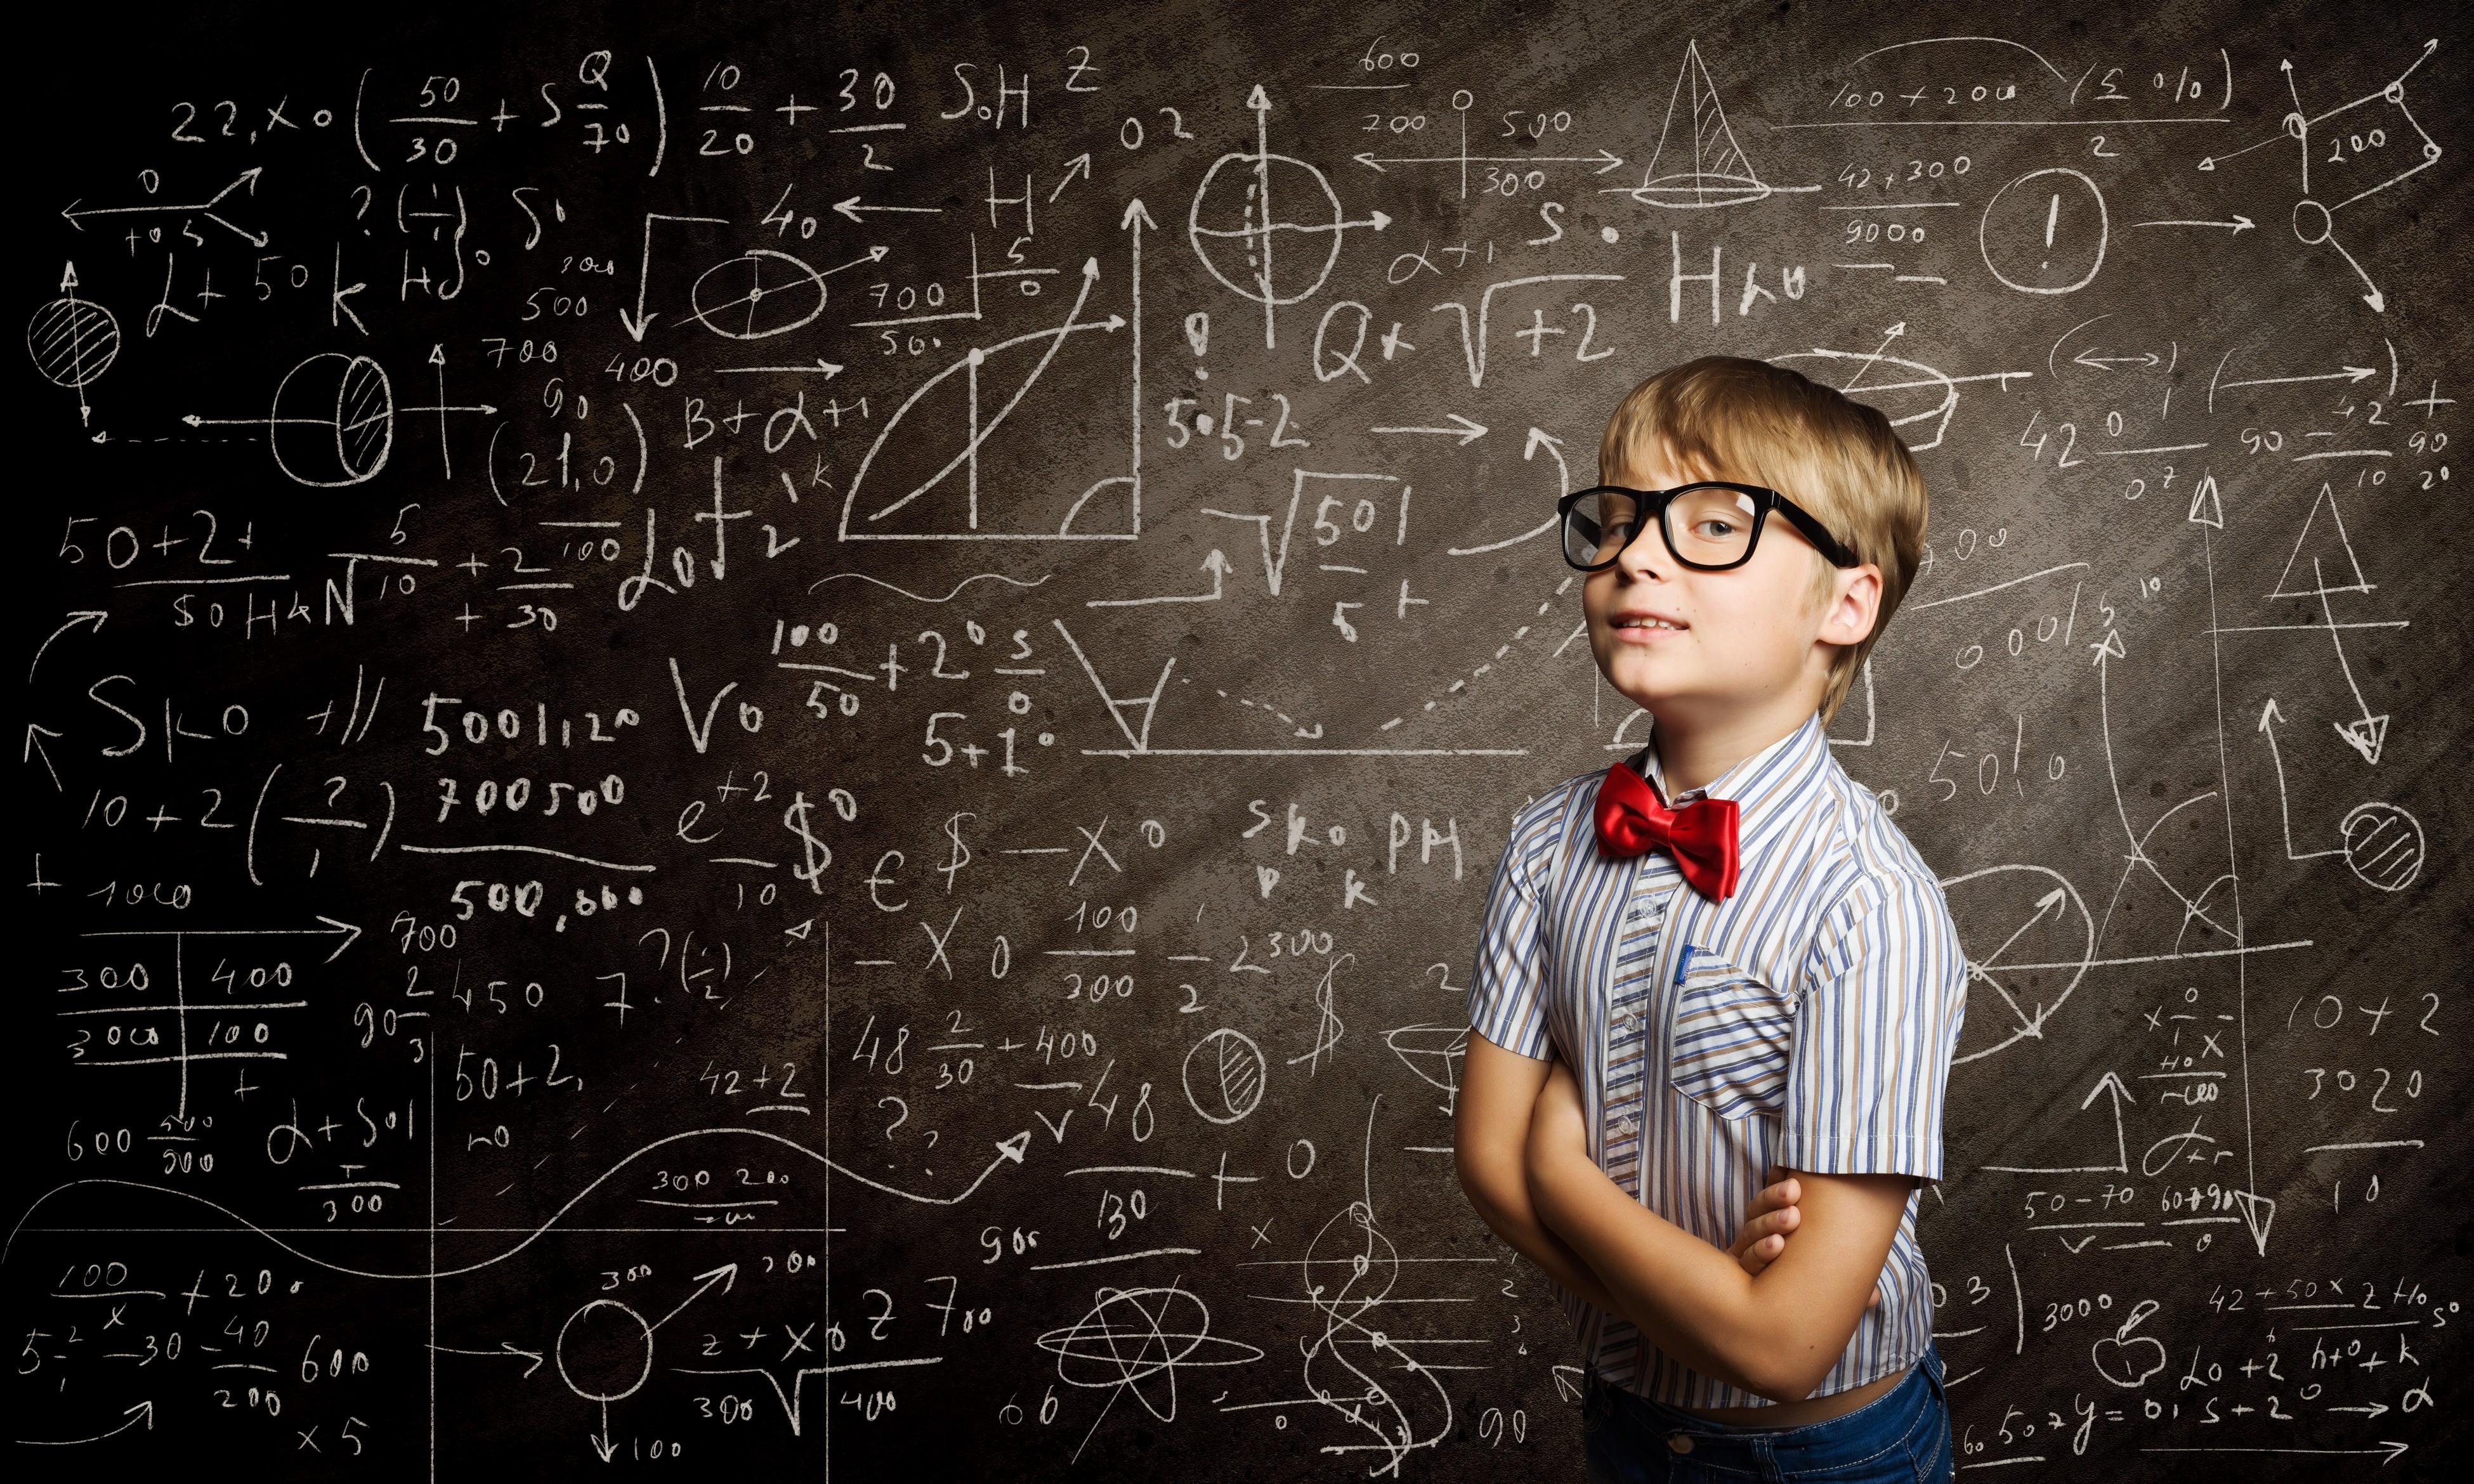 вход школа формулы картинки любимым артистом